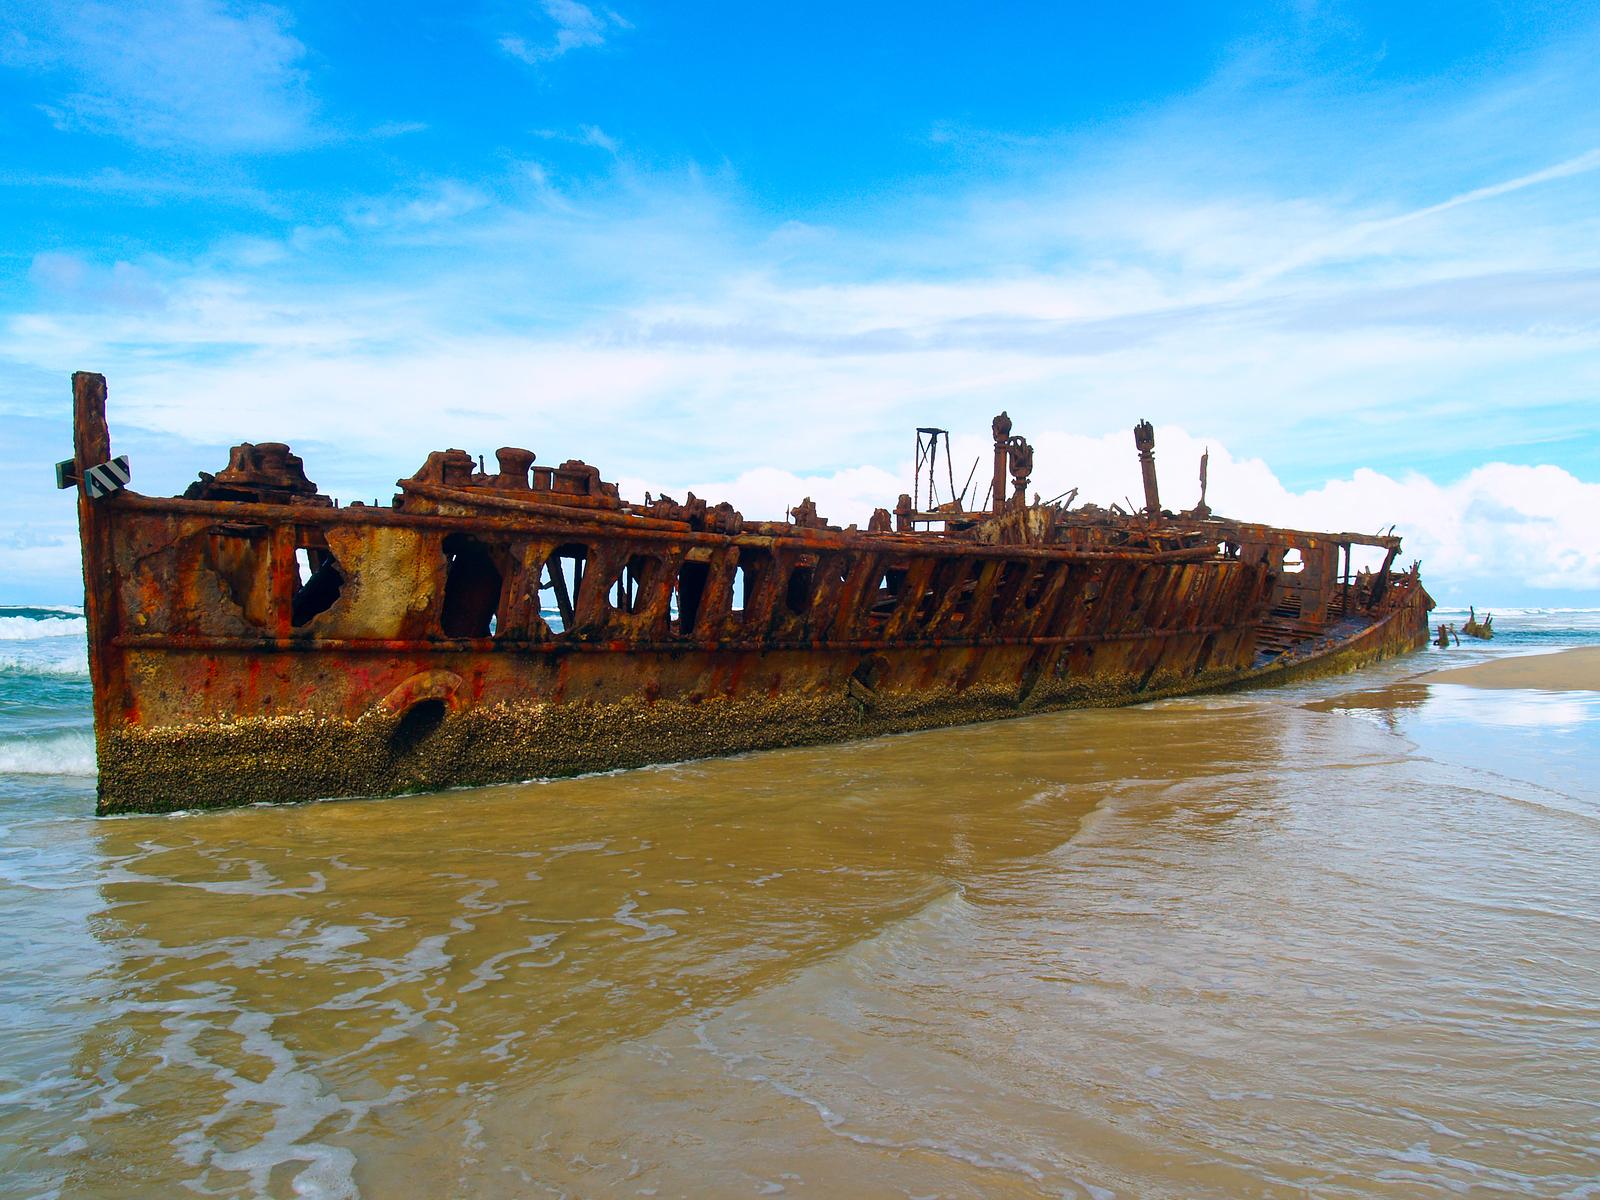 bigstock-The-Maheno-Wreck-3718624.jpg